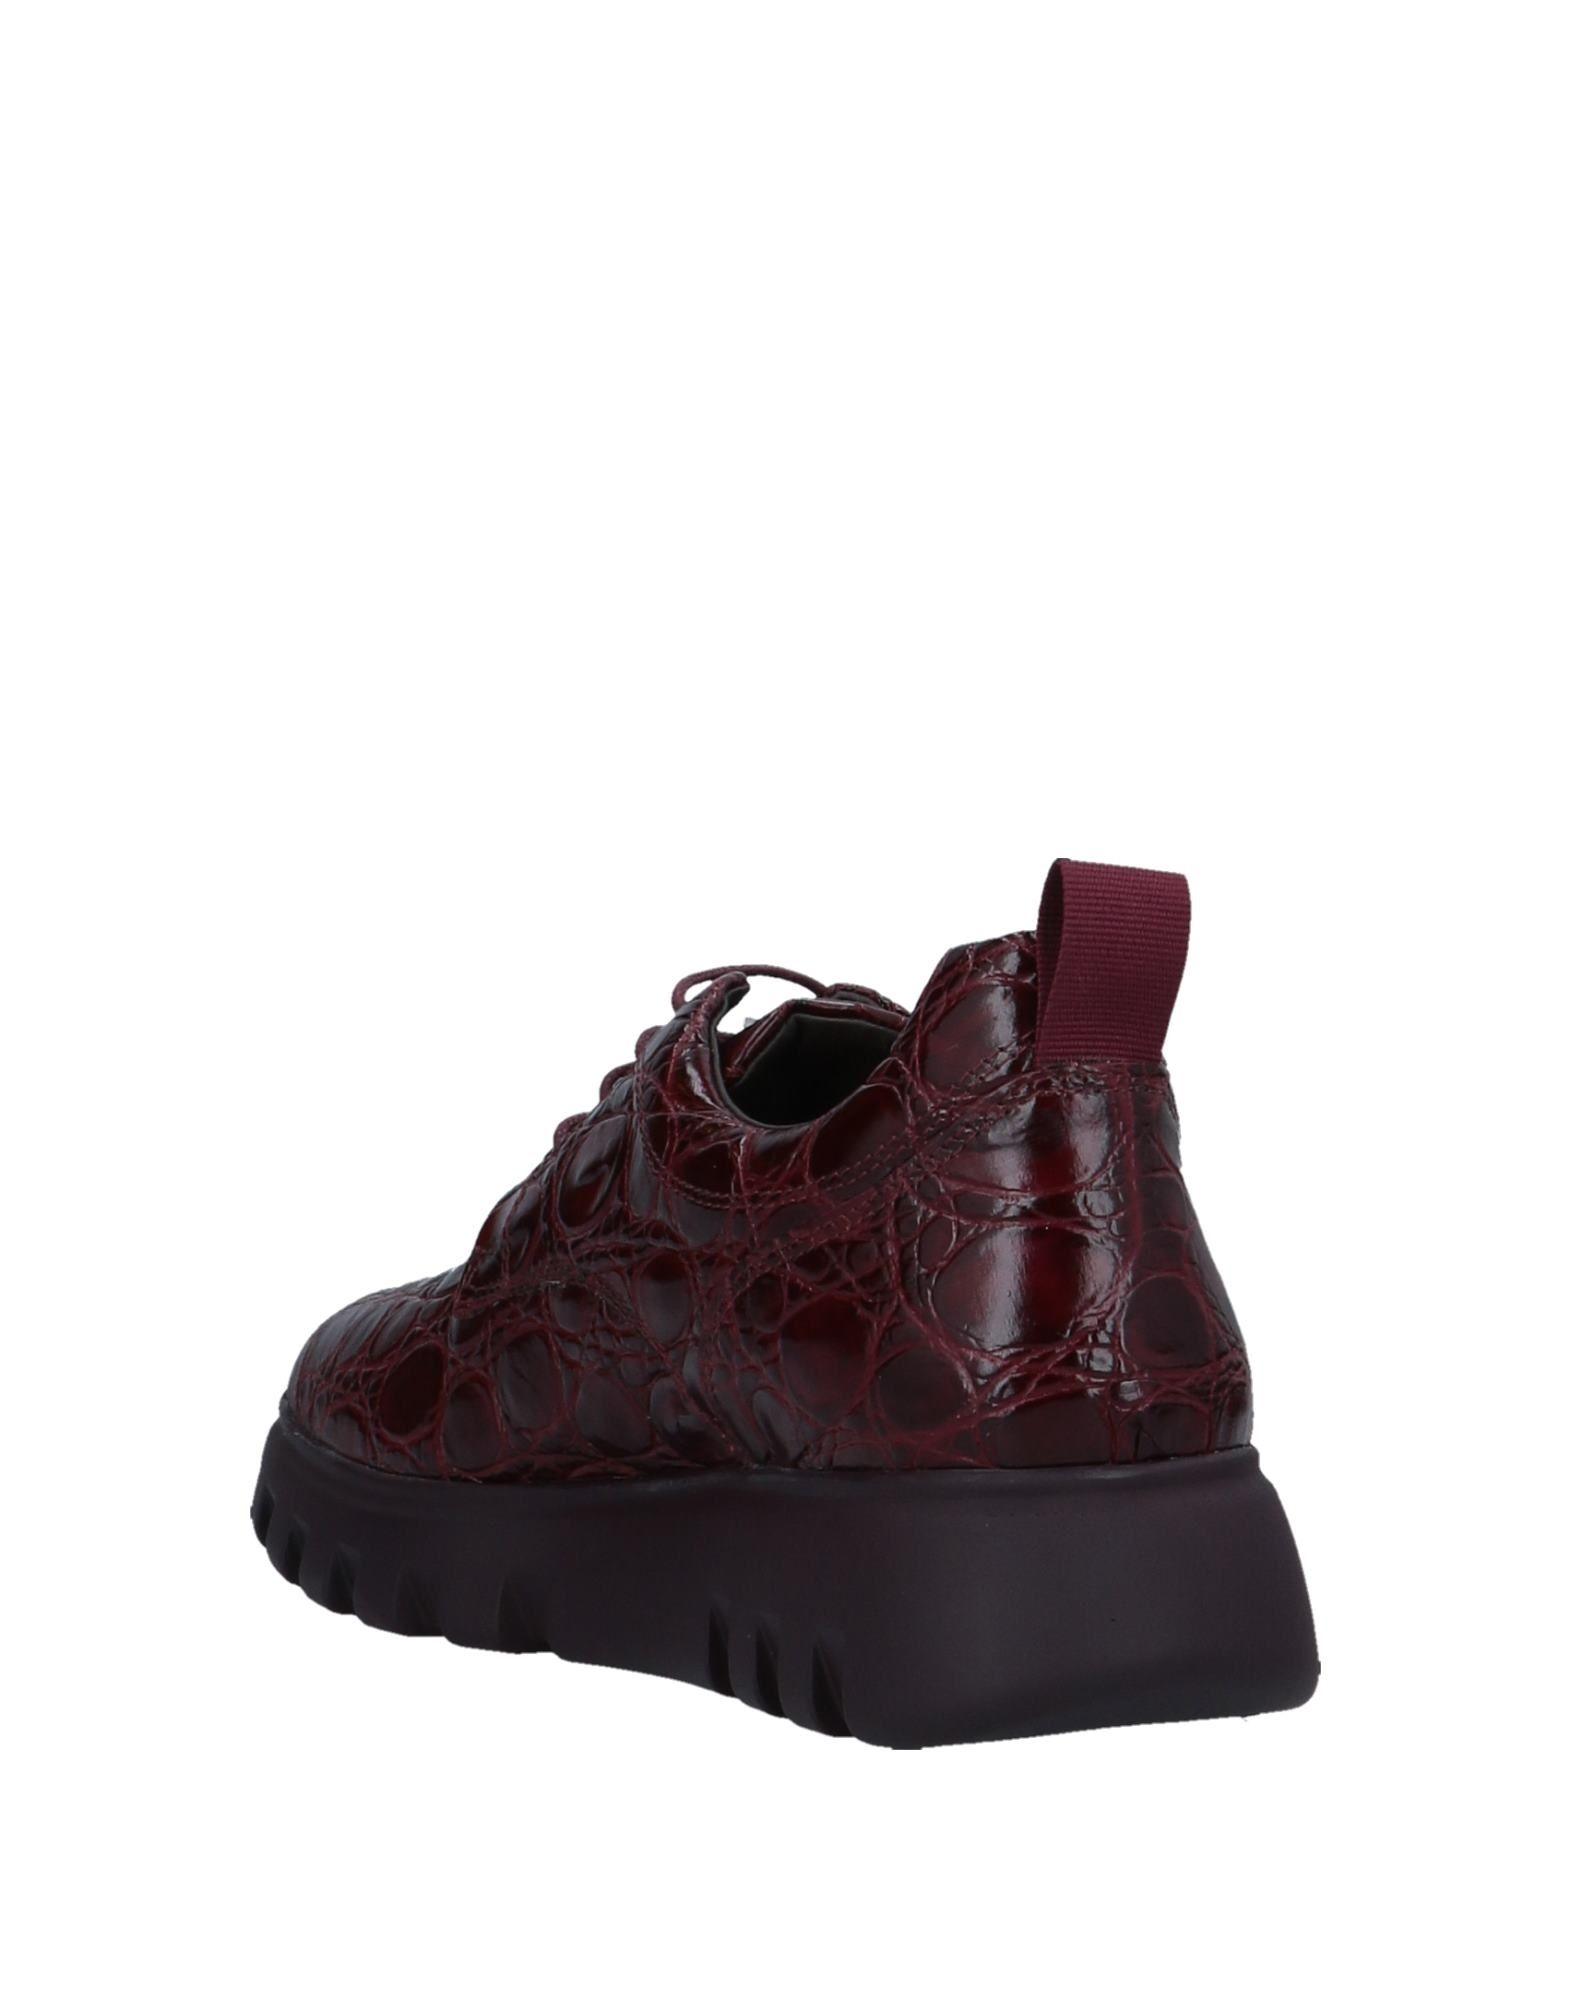 Gut um billige Schuhe Damen zu tragenVoile Blanche Schnürschuhe Damen Schuhe  11538363EO 8e8e62